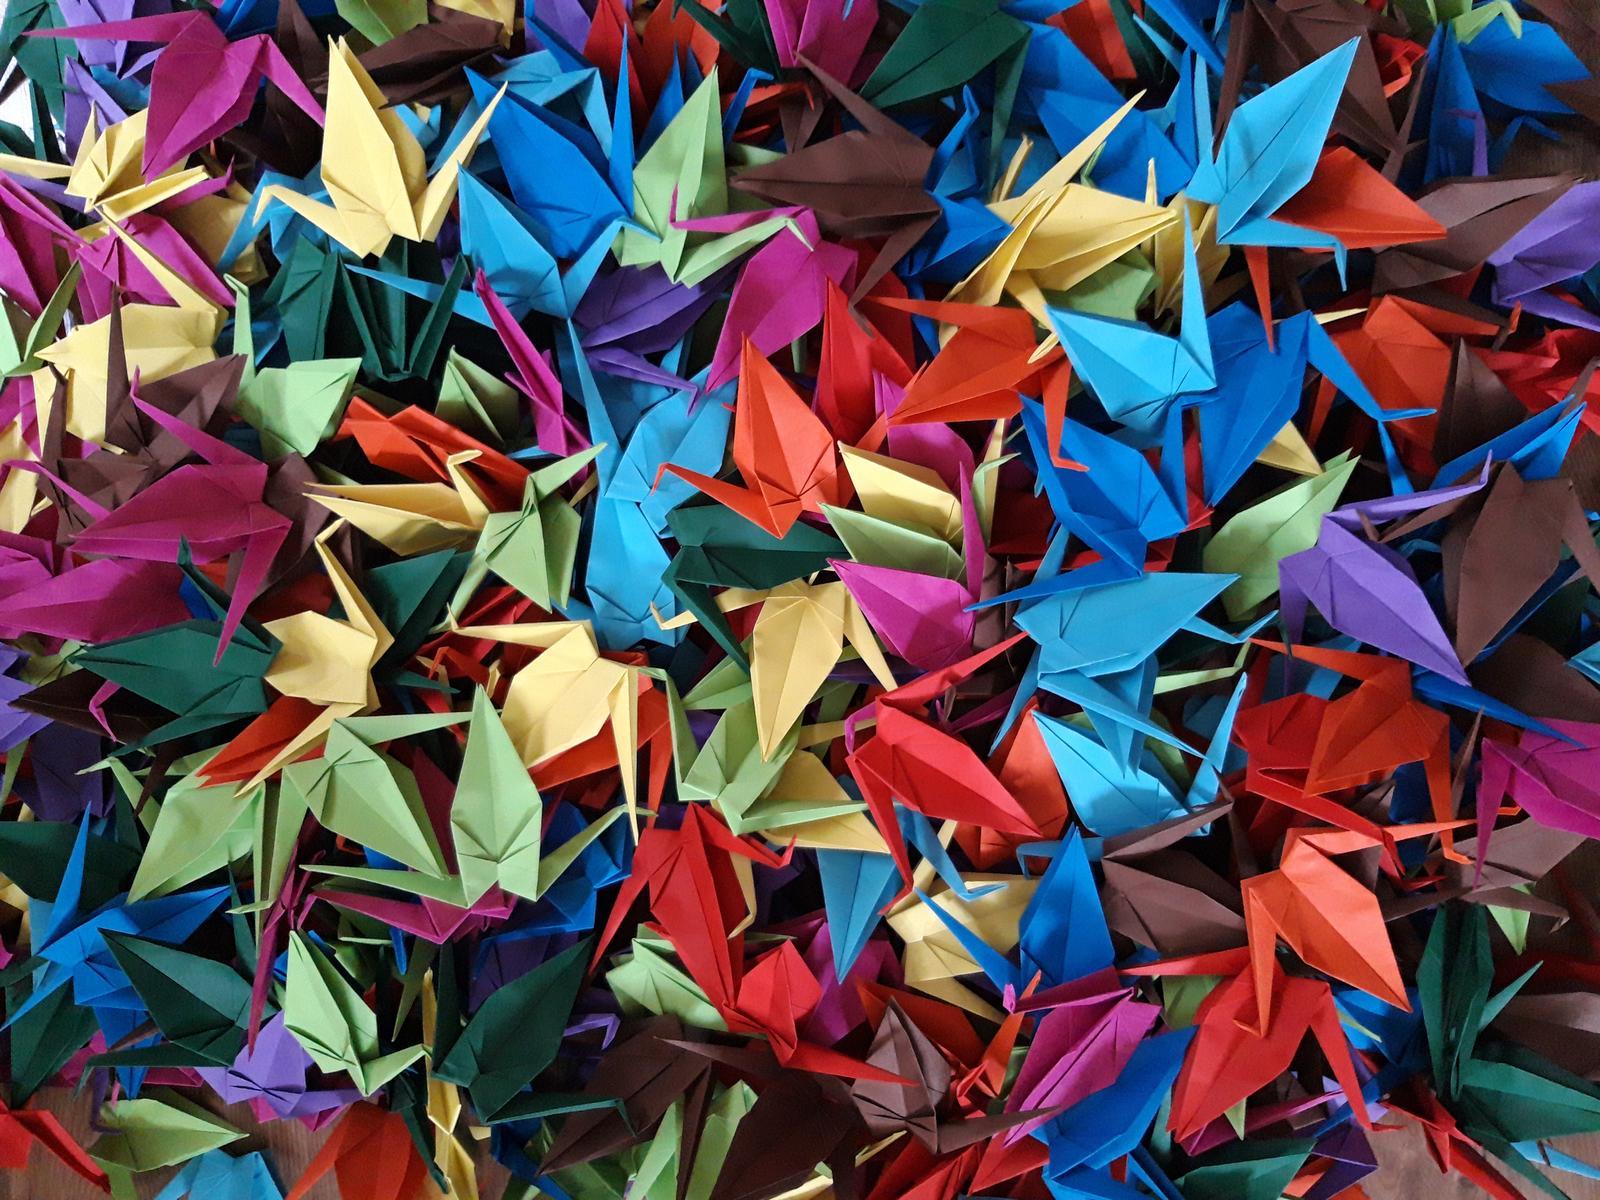 Origami jeřábi dekorace  - Obrázek č. 1